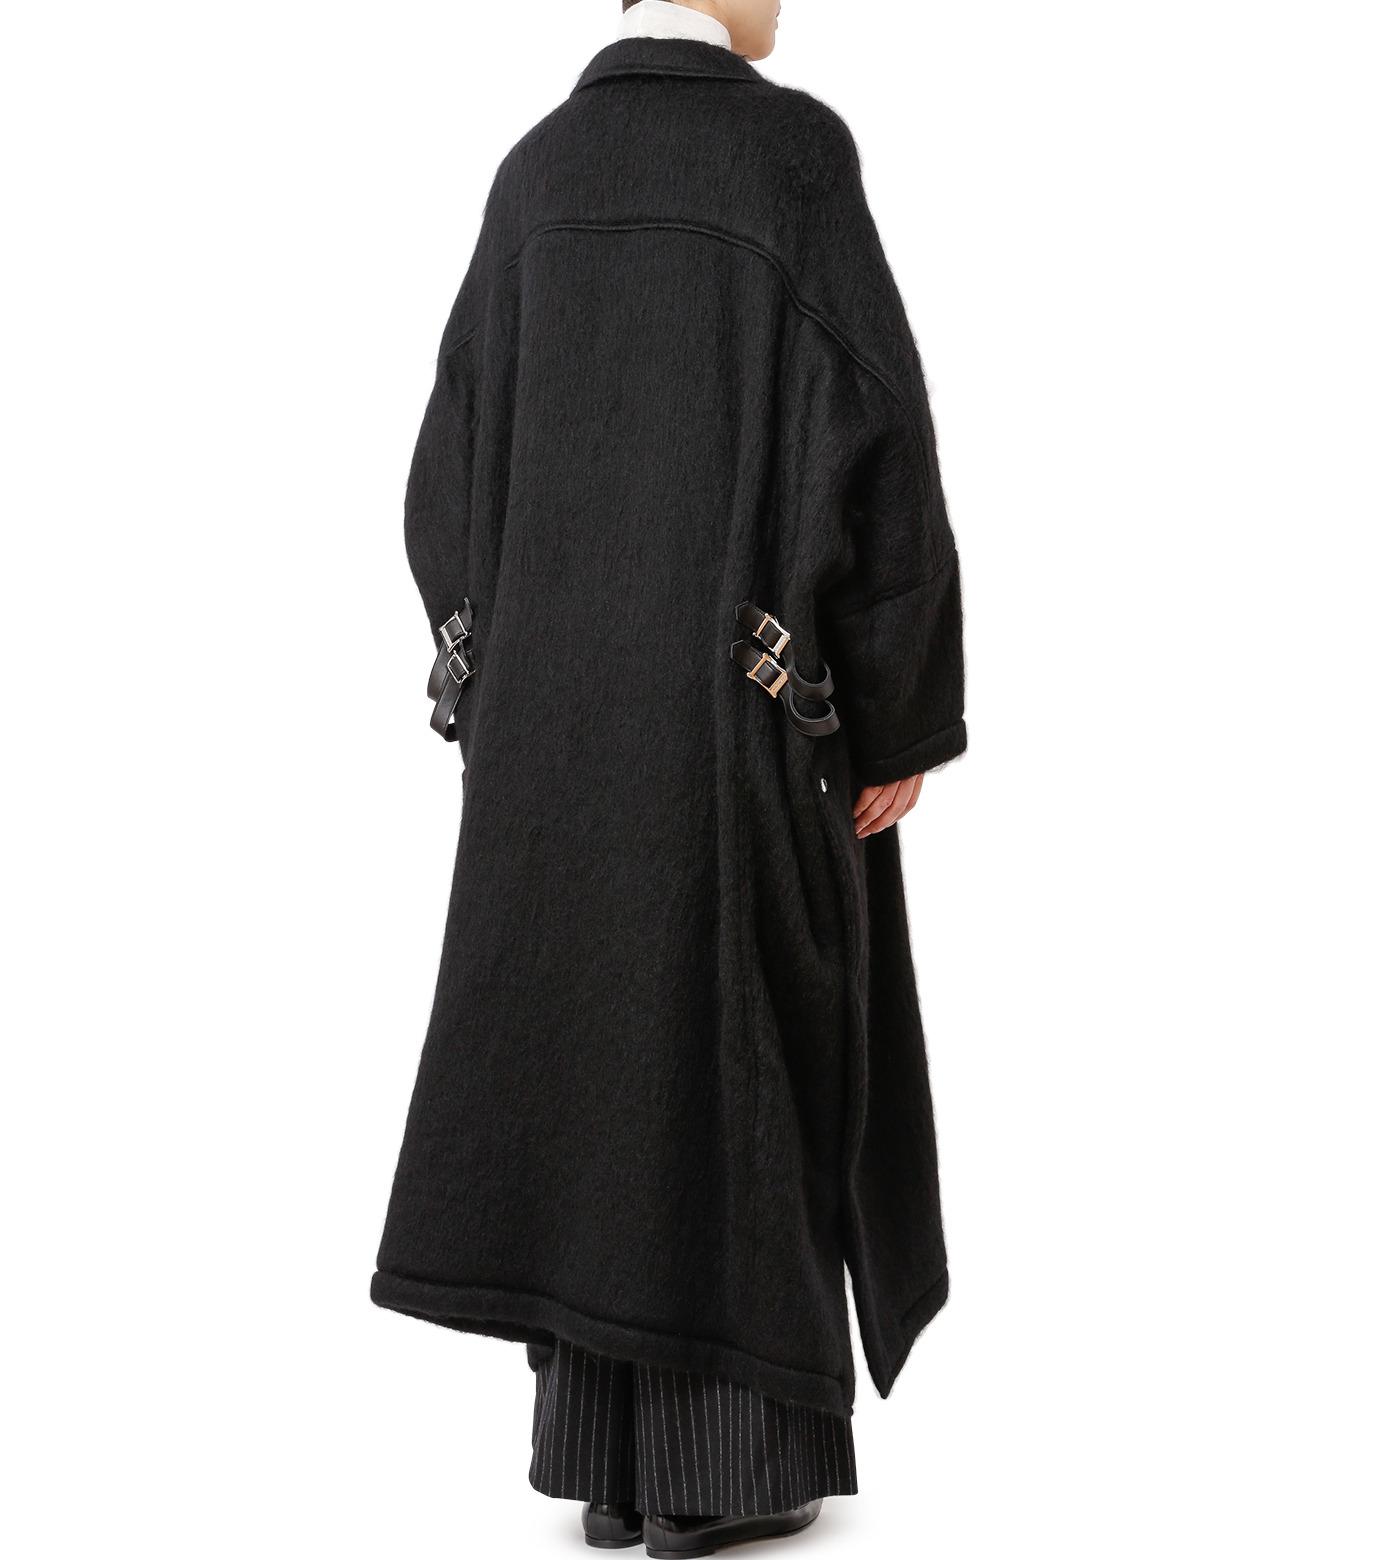 CHRISTIAN DADA(クリスチャン ダダ)のOversized Motorcycle Coat-BLACK(コート/coat)-16W-D-0301-13 拡大詳細画像2